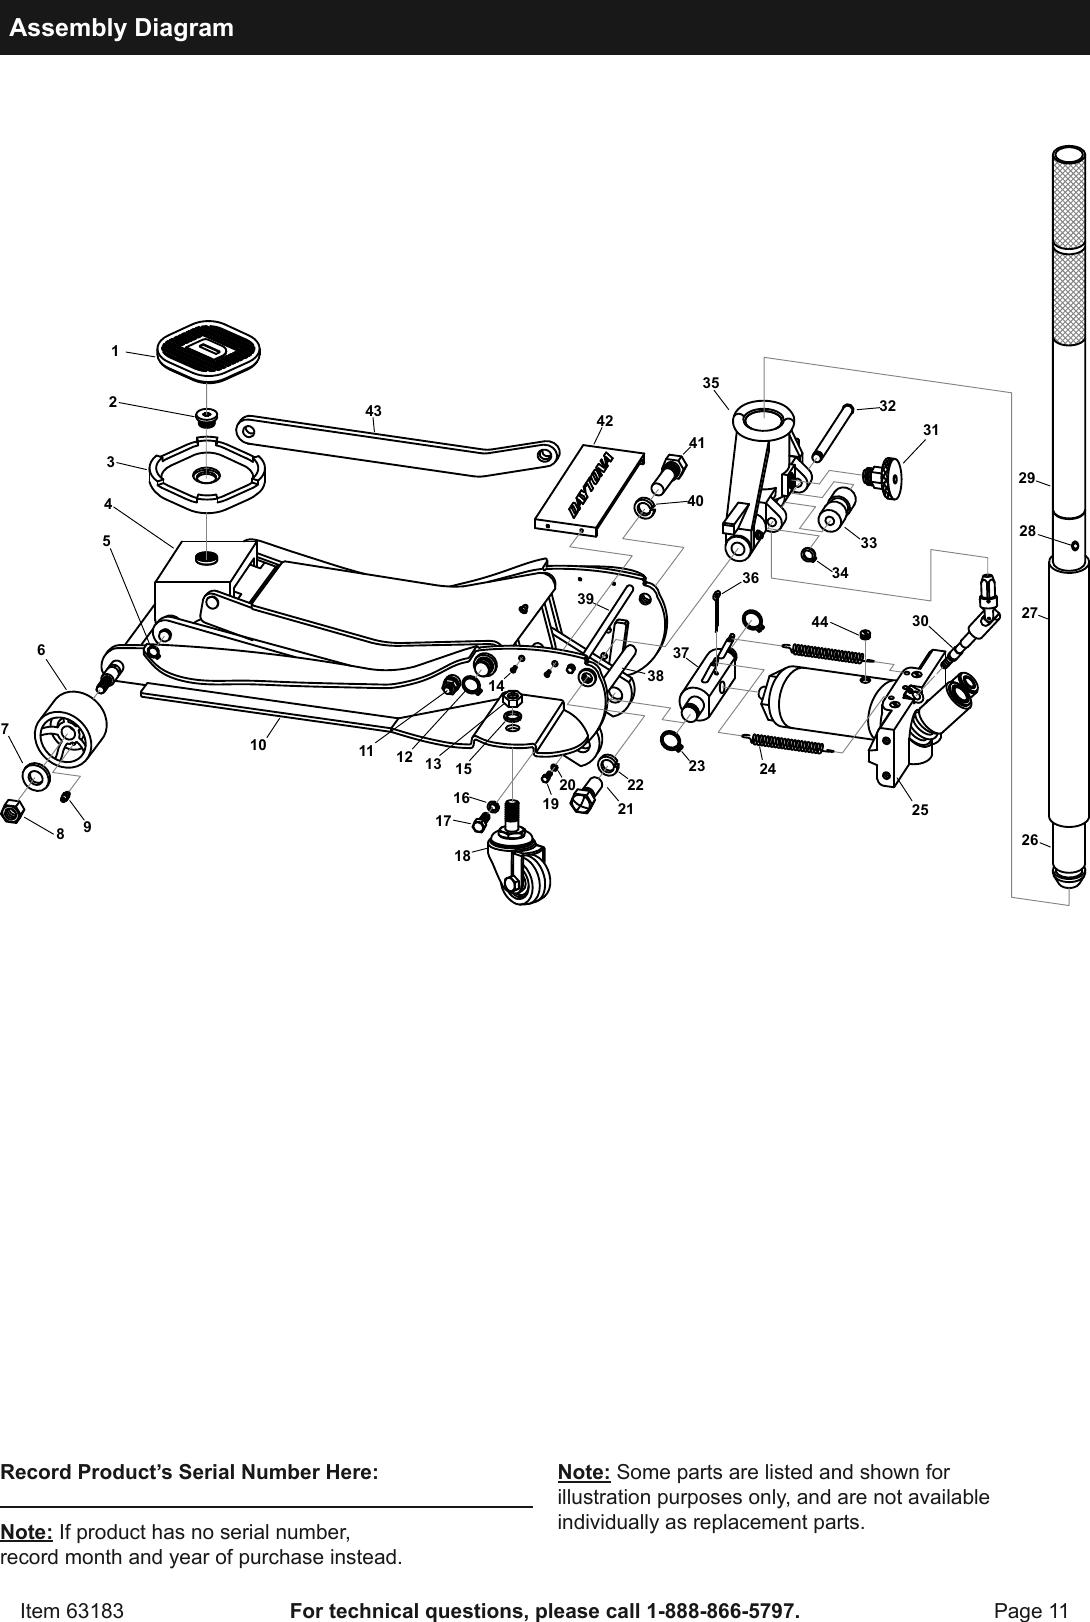 Manual For The 63183 3 Ton Daytona Professional Steel